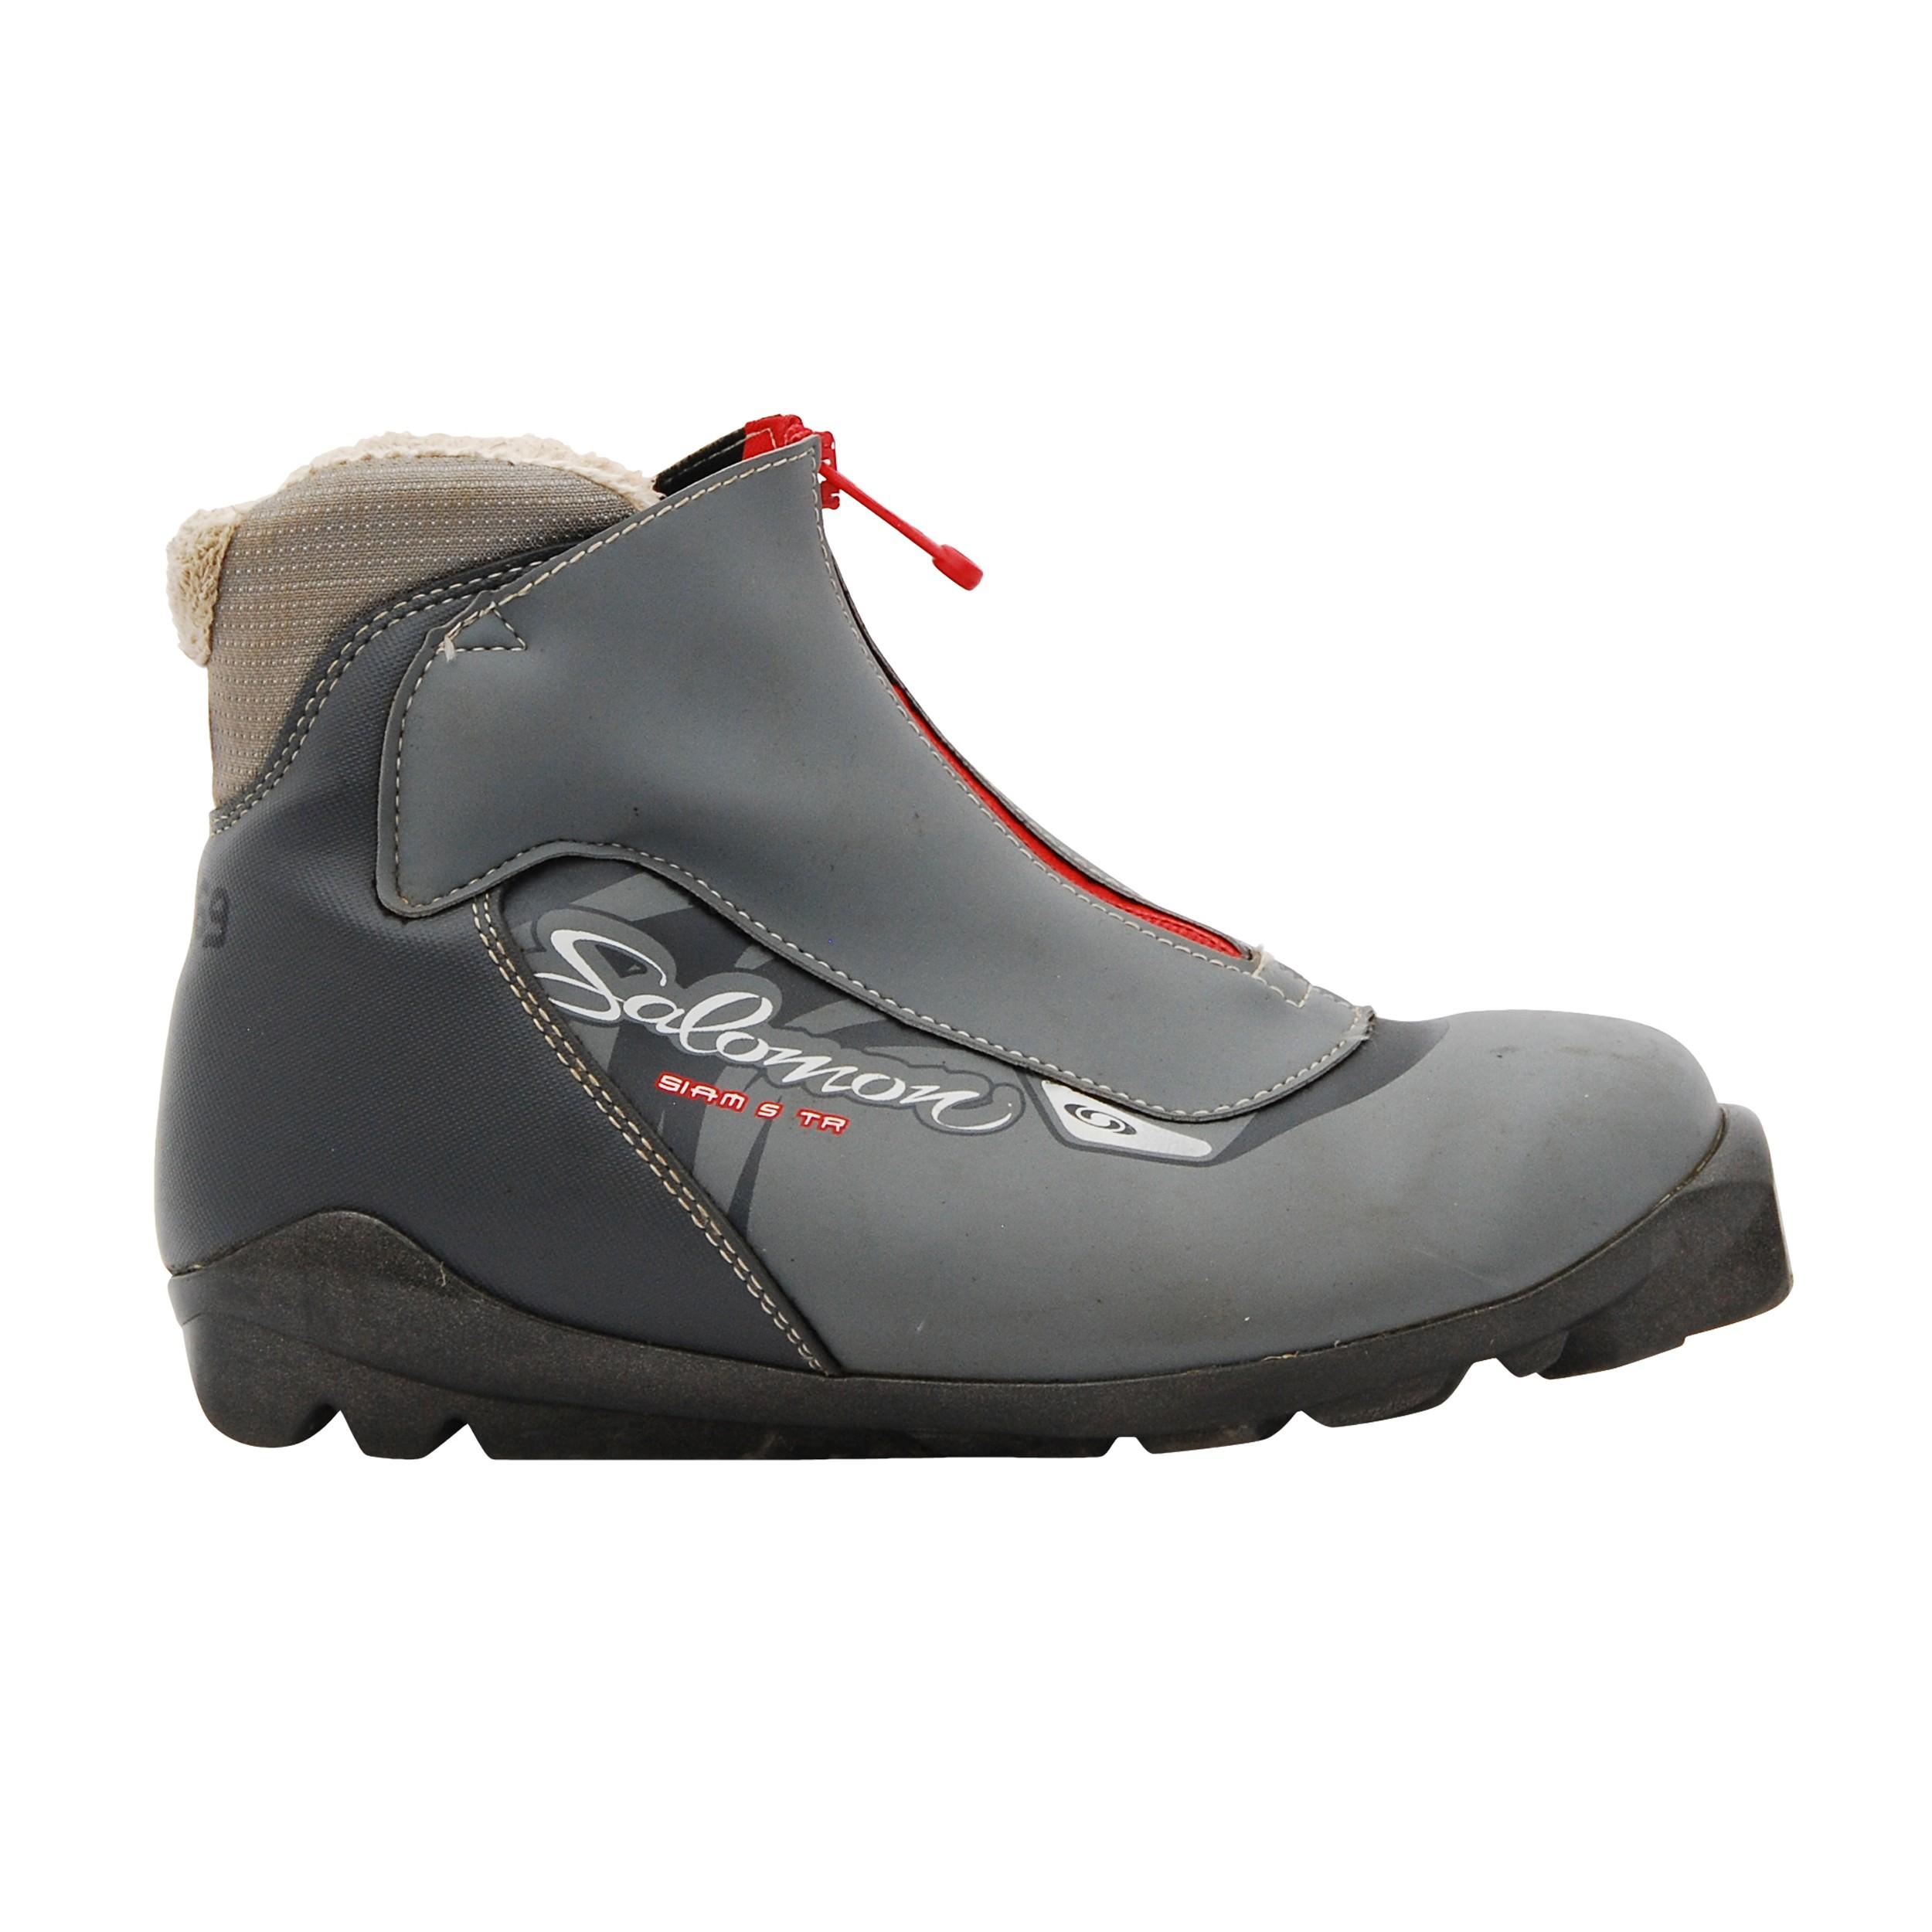 Chaussure ski fond occasion Salomon Siam 5 TR gris